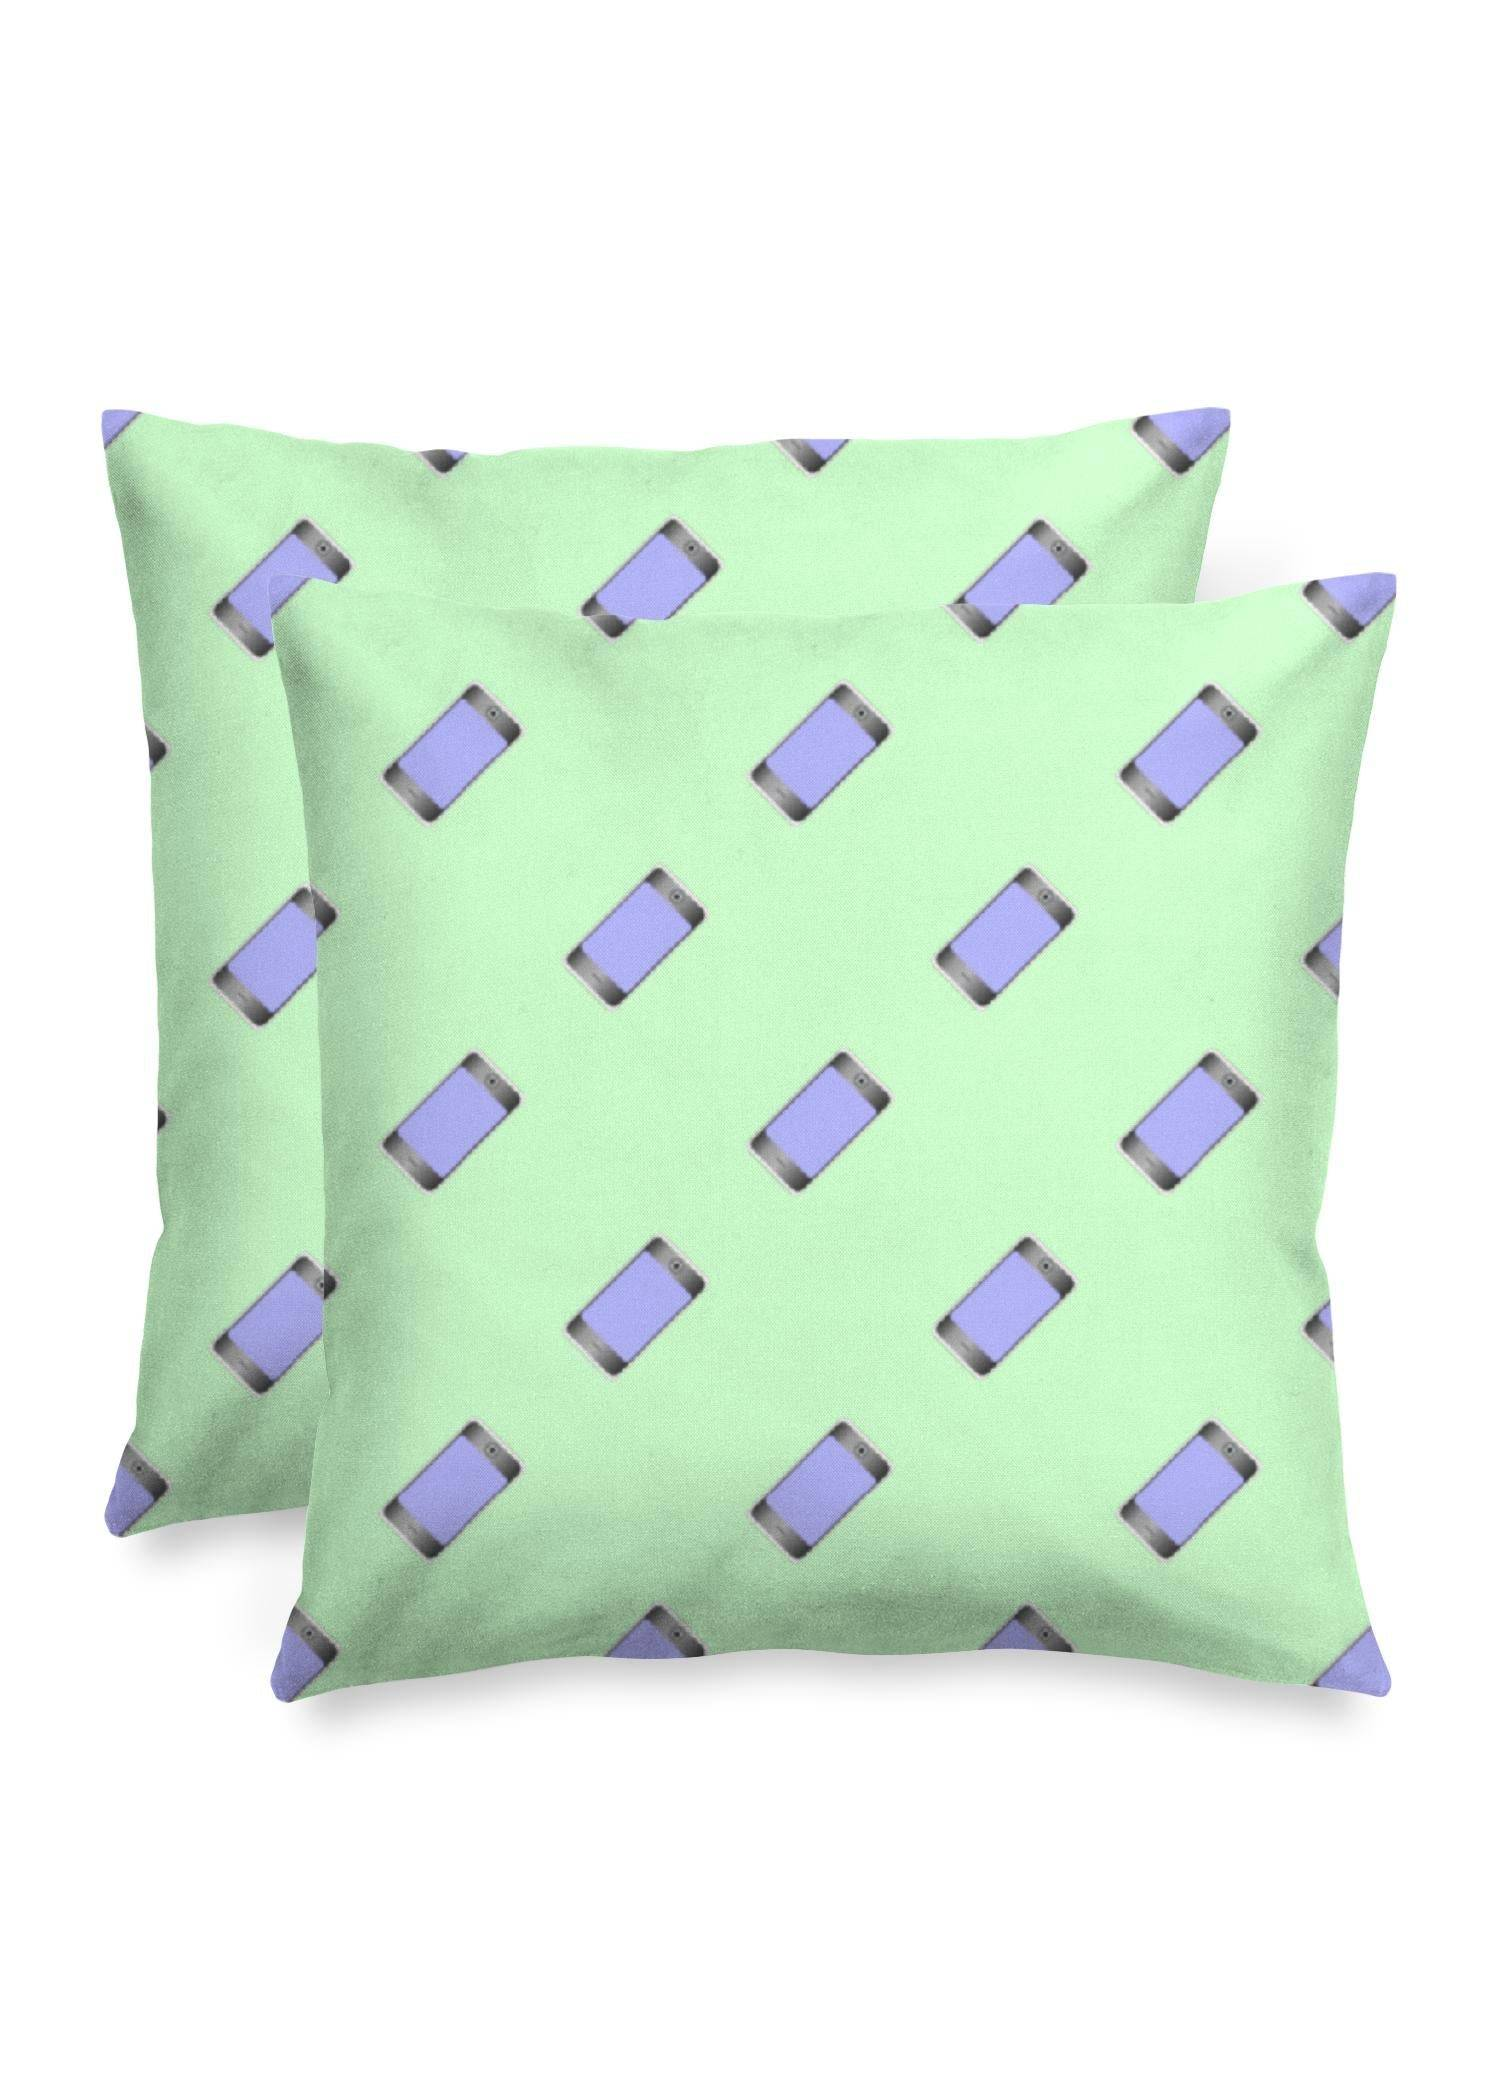 "VIDA Square Pillow - Mobile Phones On Green in Green by VIDA Original Artist  - Size: Luster / 20"" / Set"